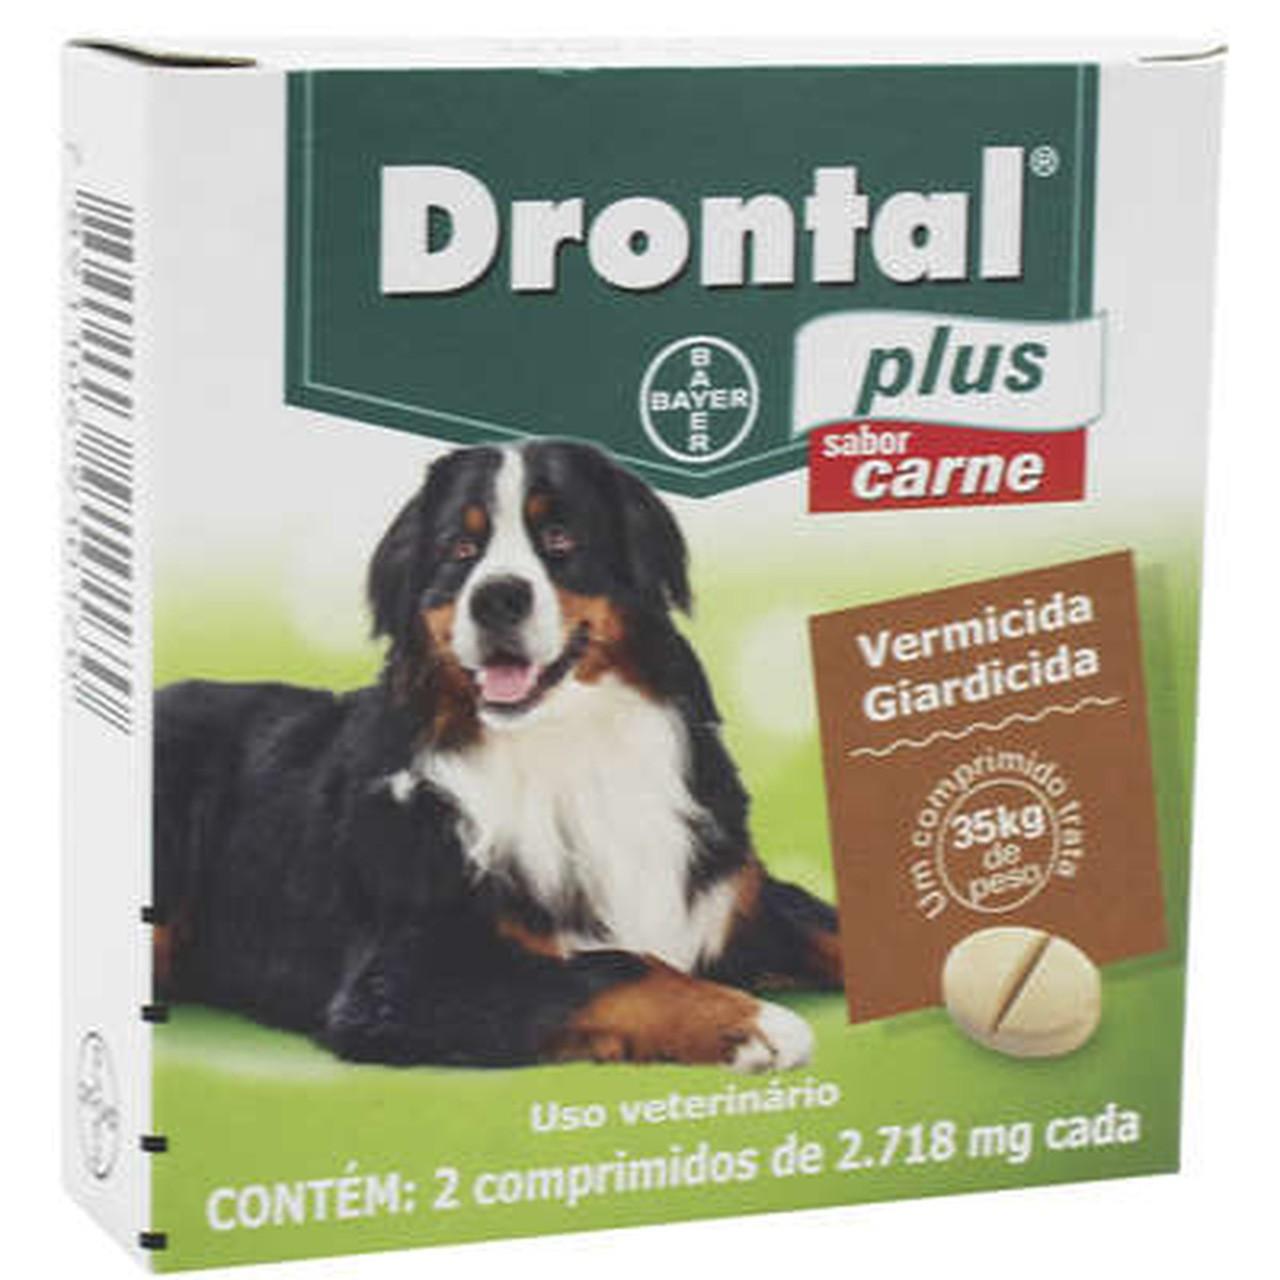 Vermífugo Drontal Plus Sabor Carne Cães 35 Kg  Bayer